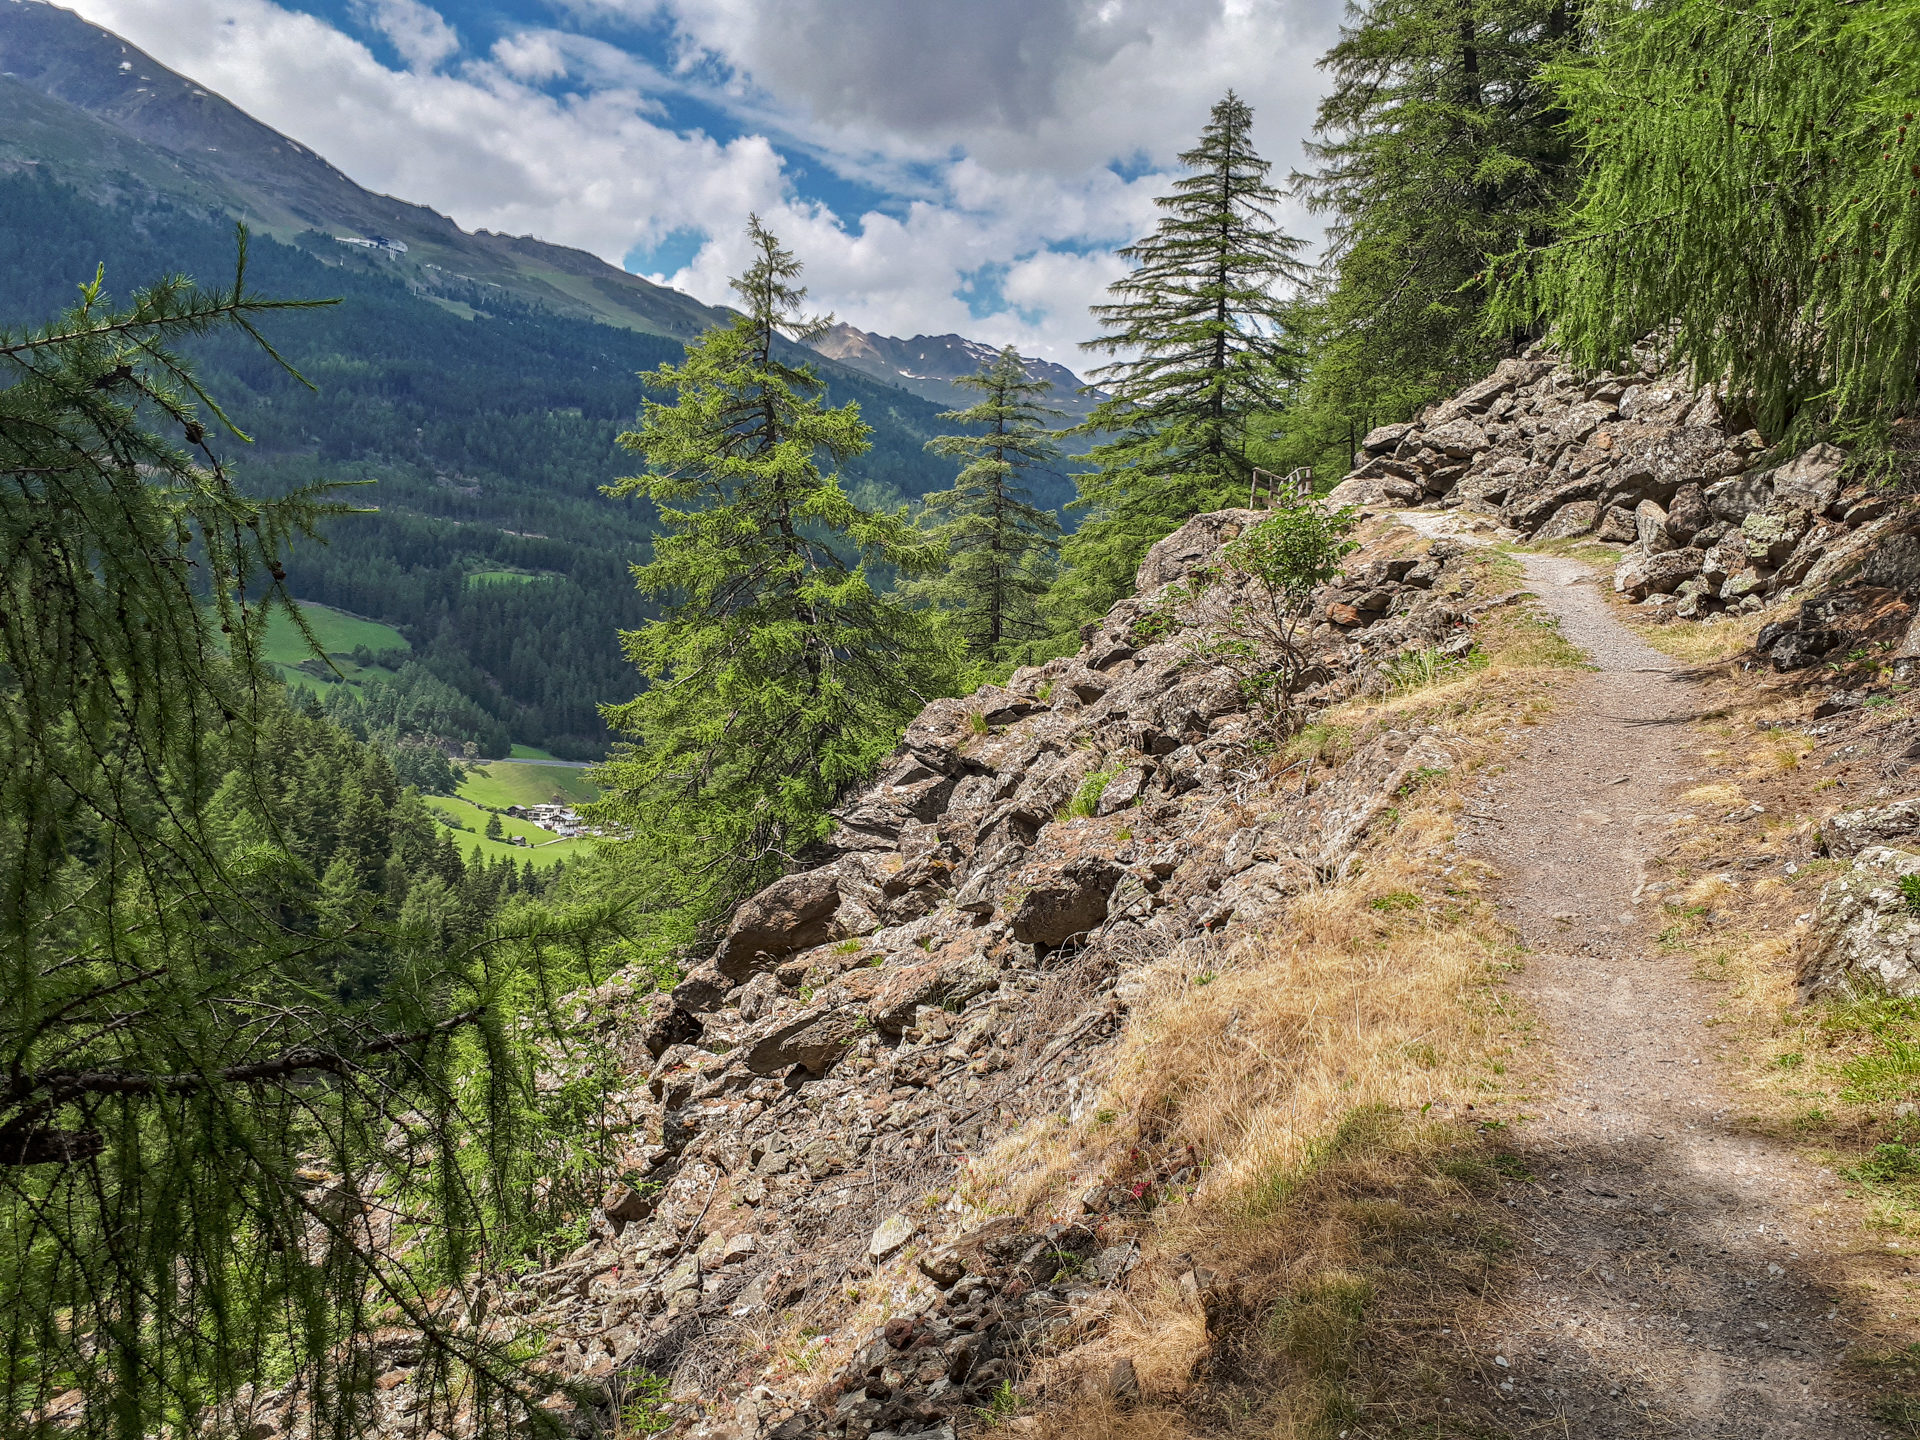 Открытый участок на Kühtrainschlucht Trail